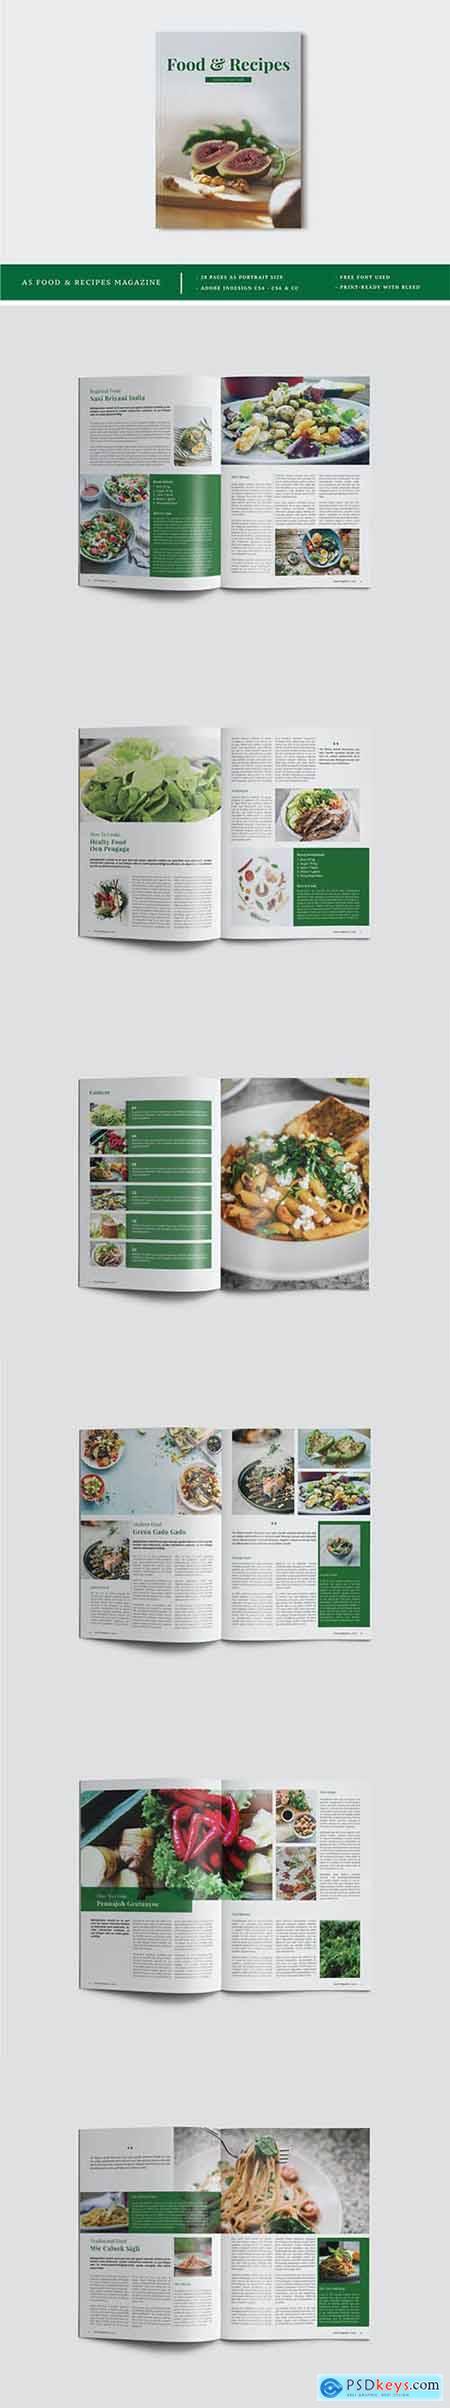 A5 Food & Recipes Magazine